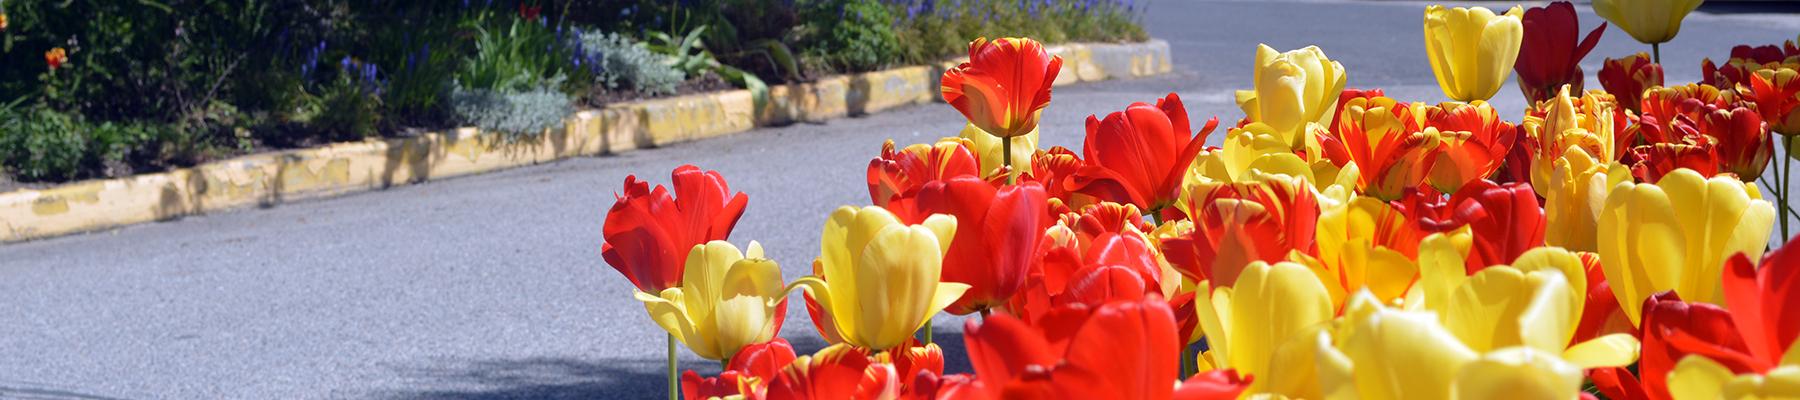 SCC Greenhouse Tulips